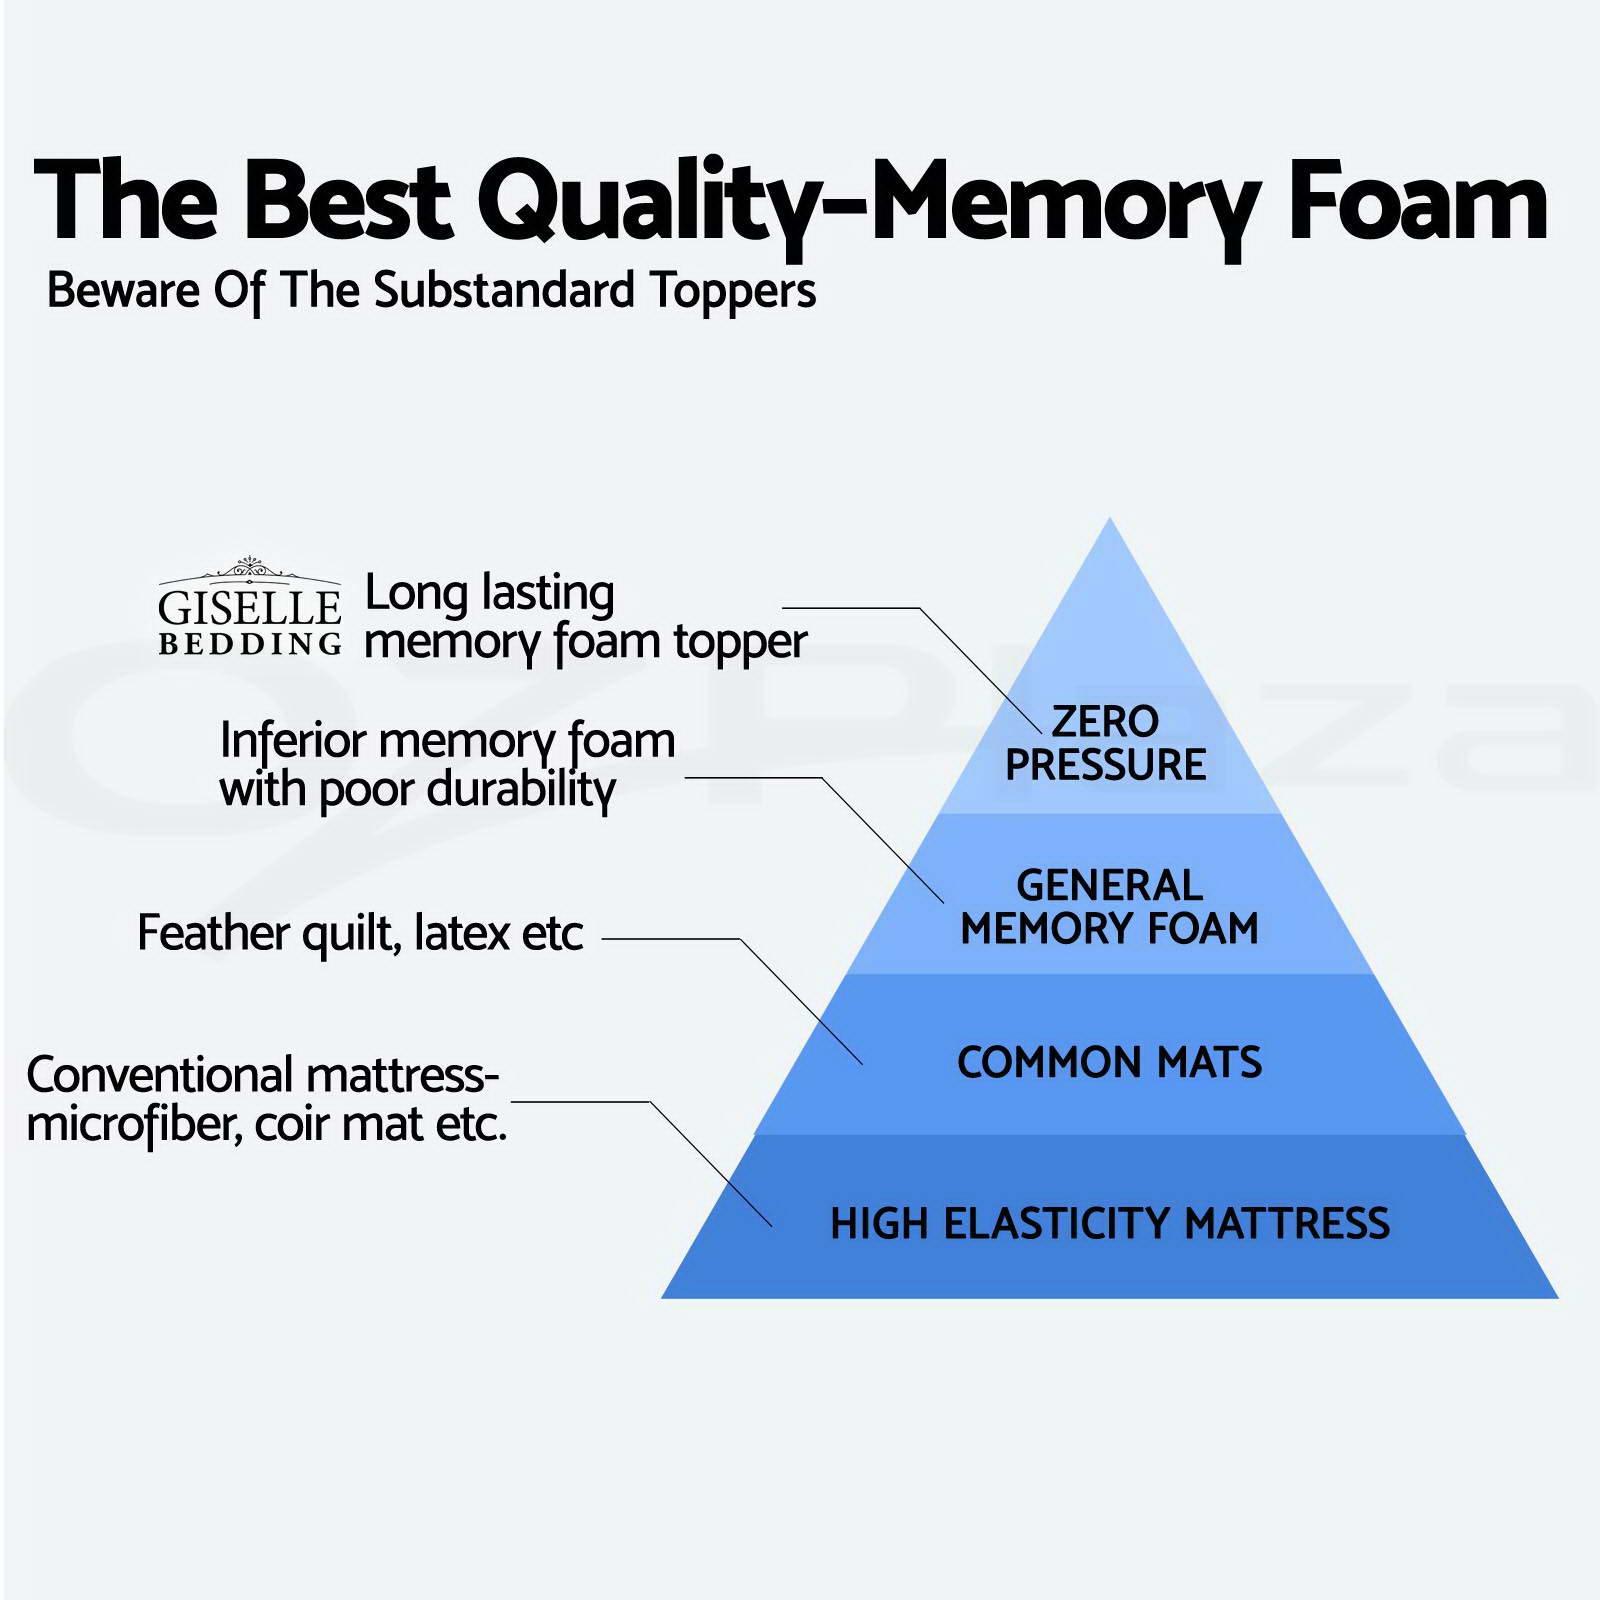 COOL-GEL-Memory-Foam-Mattress-Topper-BAMBOO-Fabric-